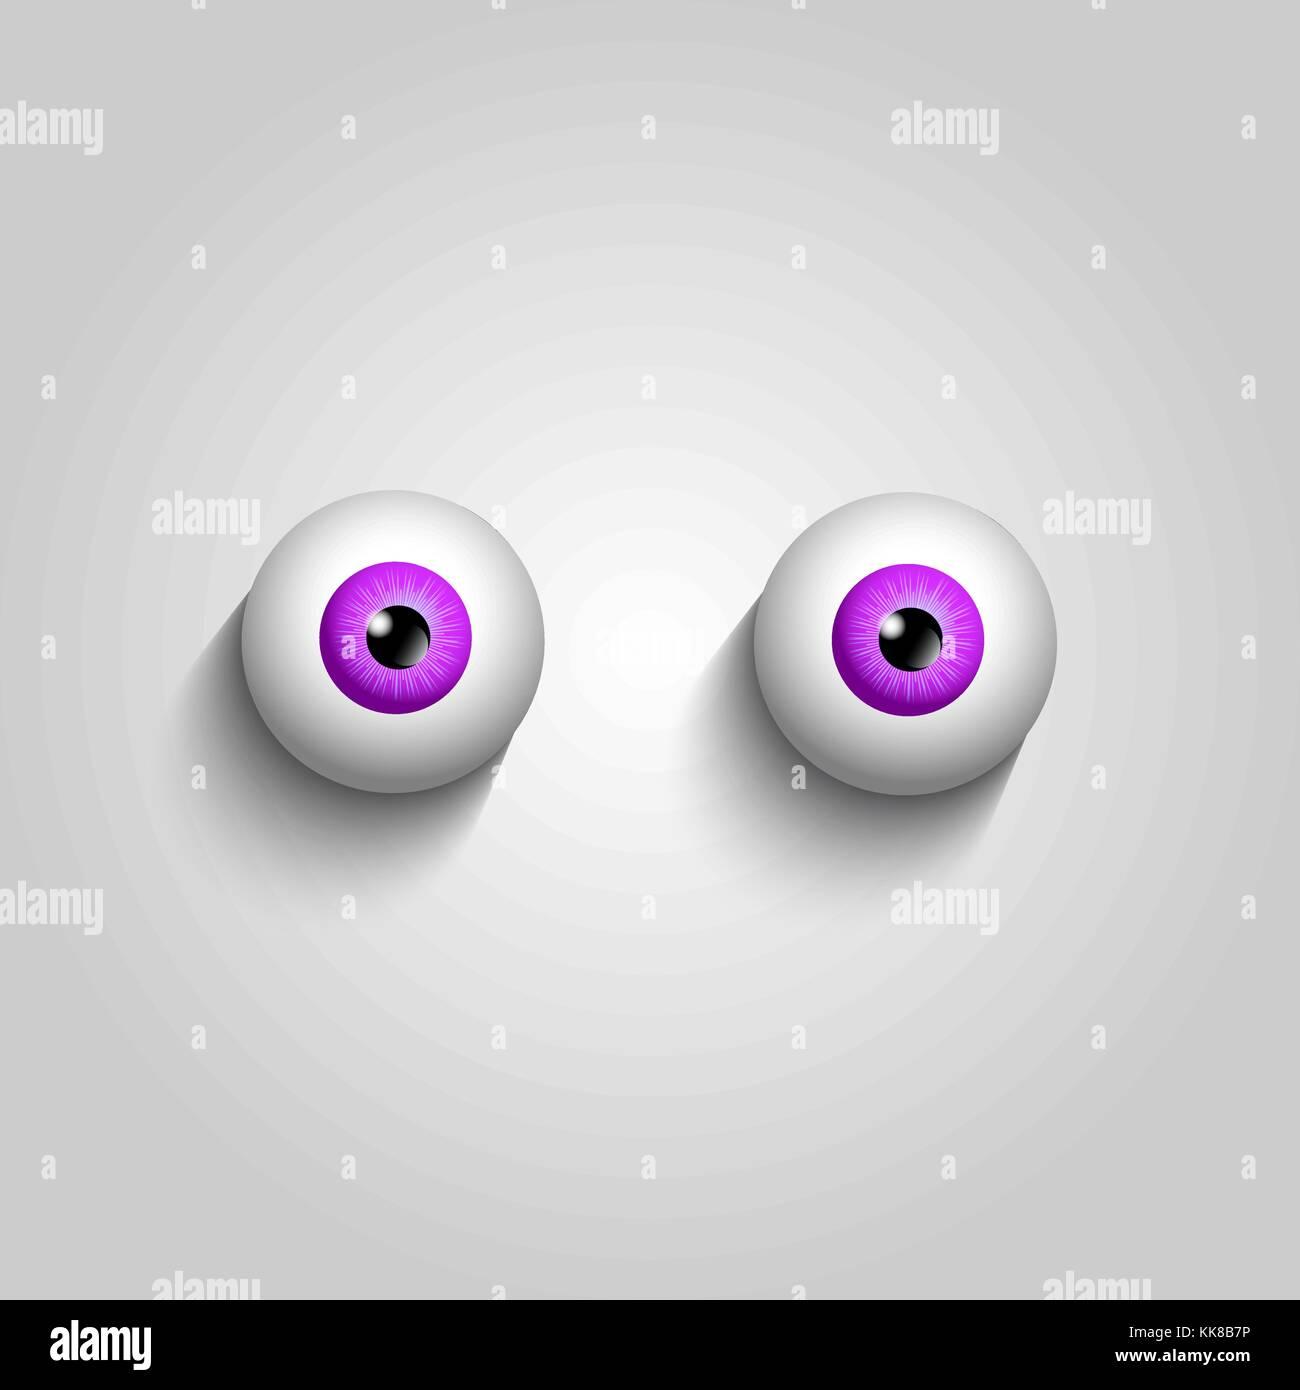 Pair of pink eyeballs isolated on white background. Vector illustration, clip art. - Stock Vector